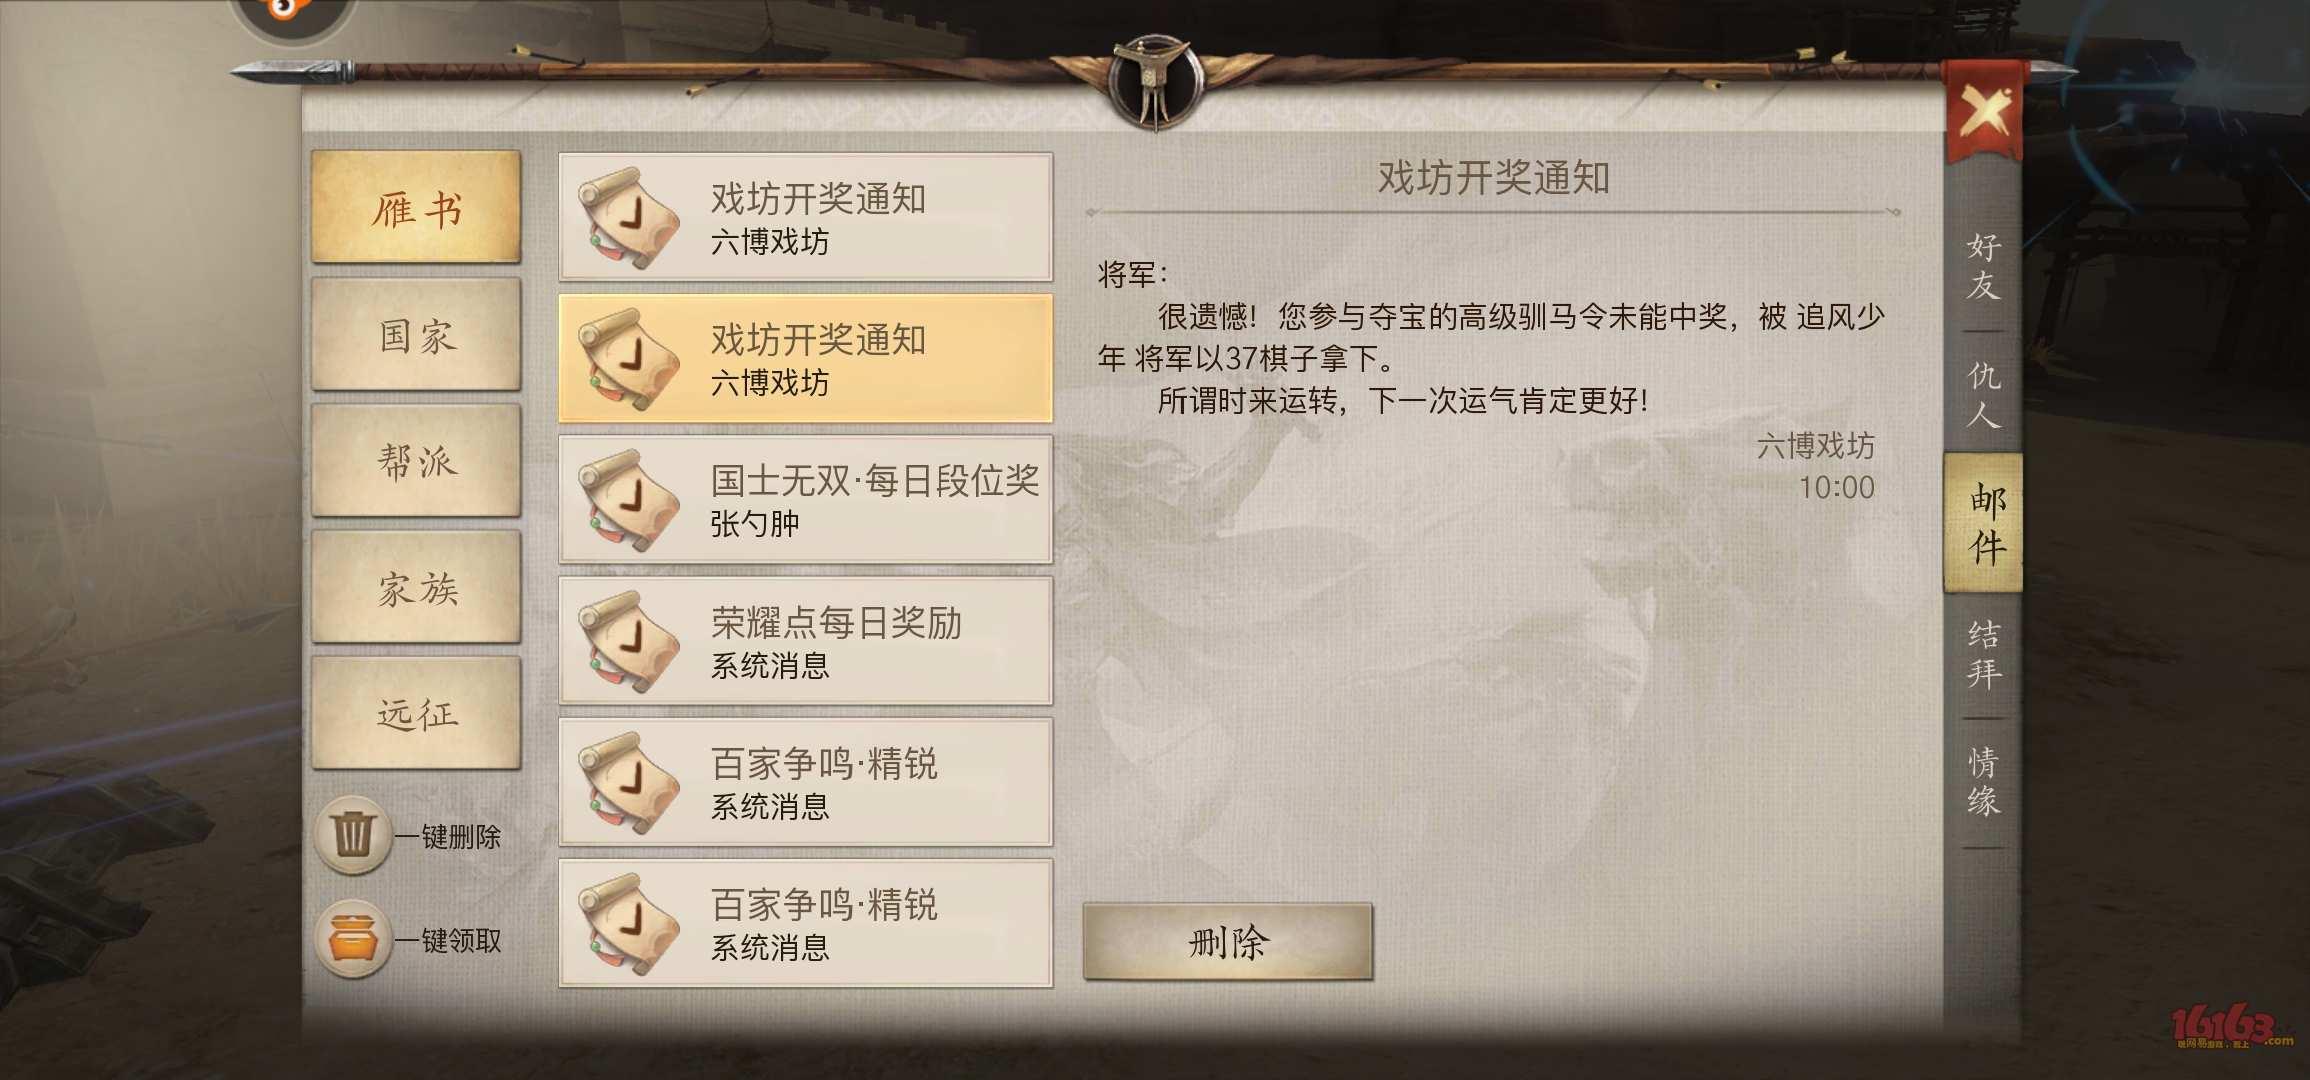 Screenshot_20200222_100308_com.netease.zgz.aligames.jpg